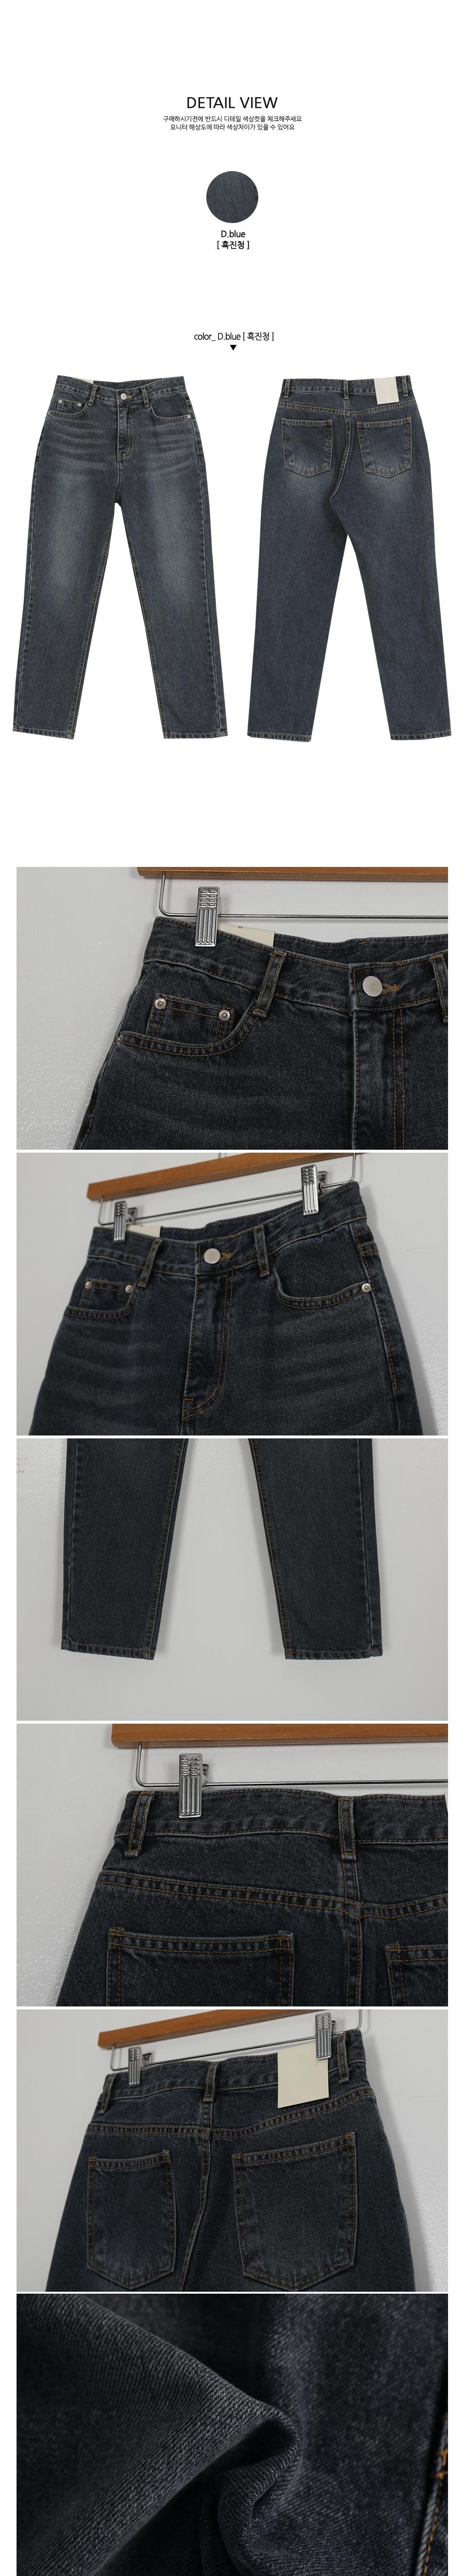 Drell Denim Pants